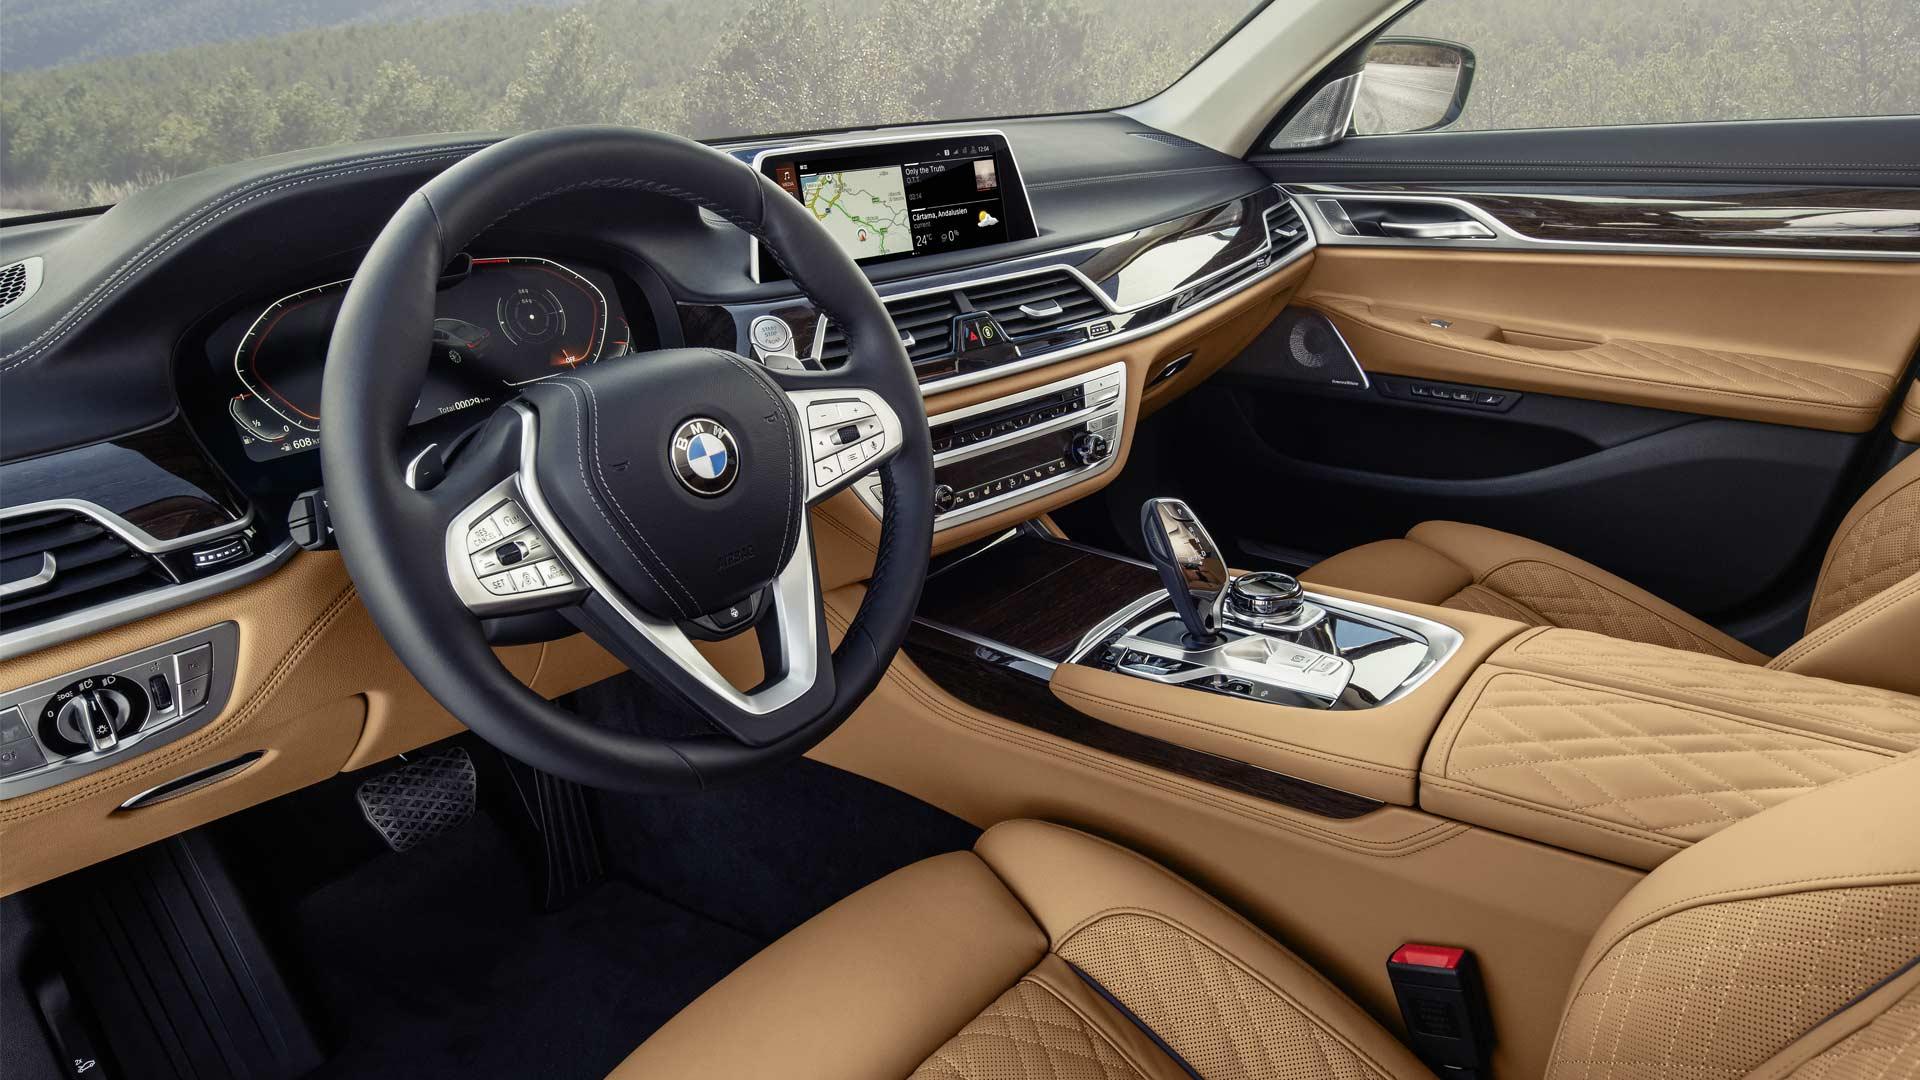 2020-BMW-7-Series-Interior_2